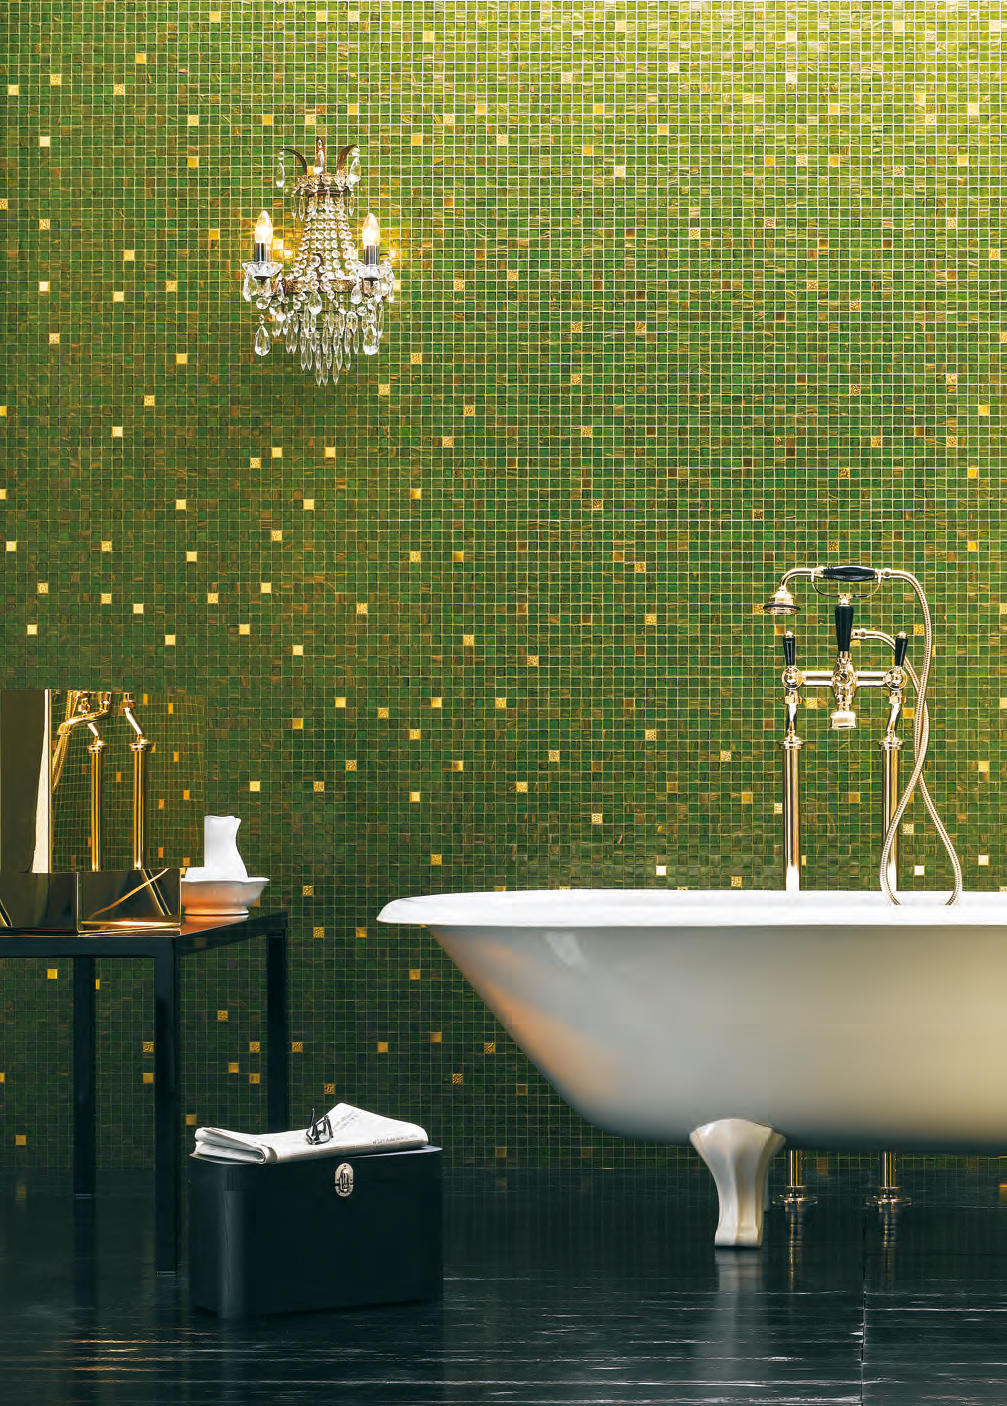 Gold collection king 20 glass mosaics from bisazza - Bisazza fliesen ...